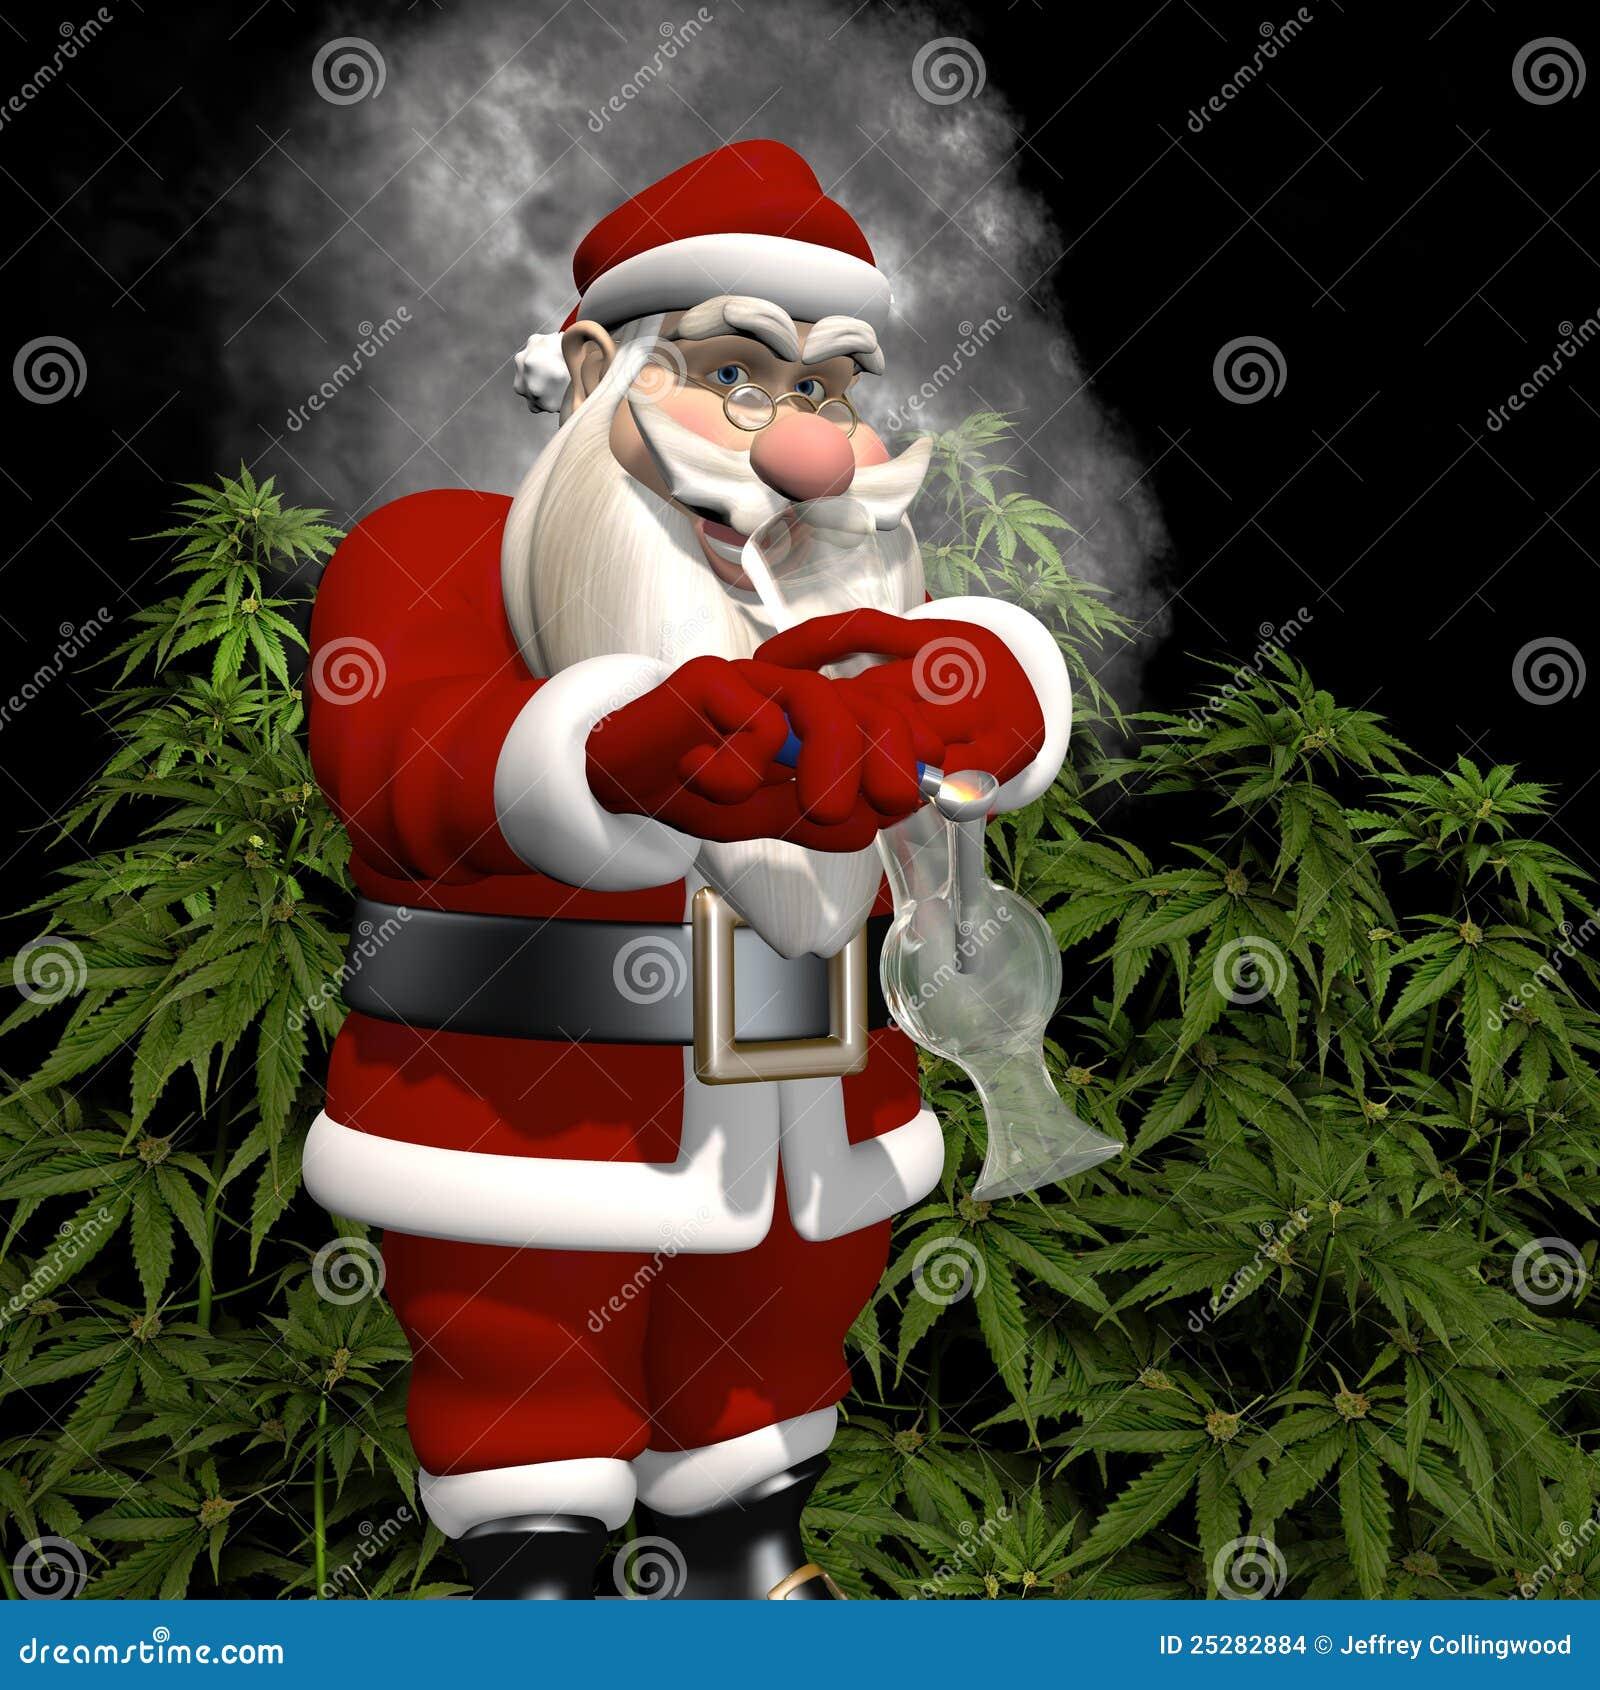 A Little Bit More For Santa Stock Images - Image: 25282884